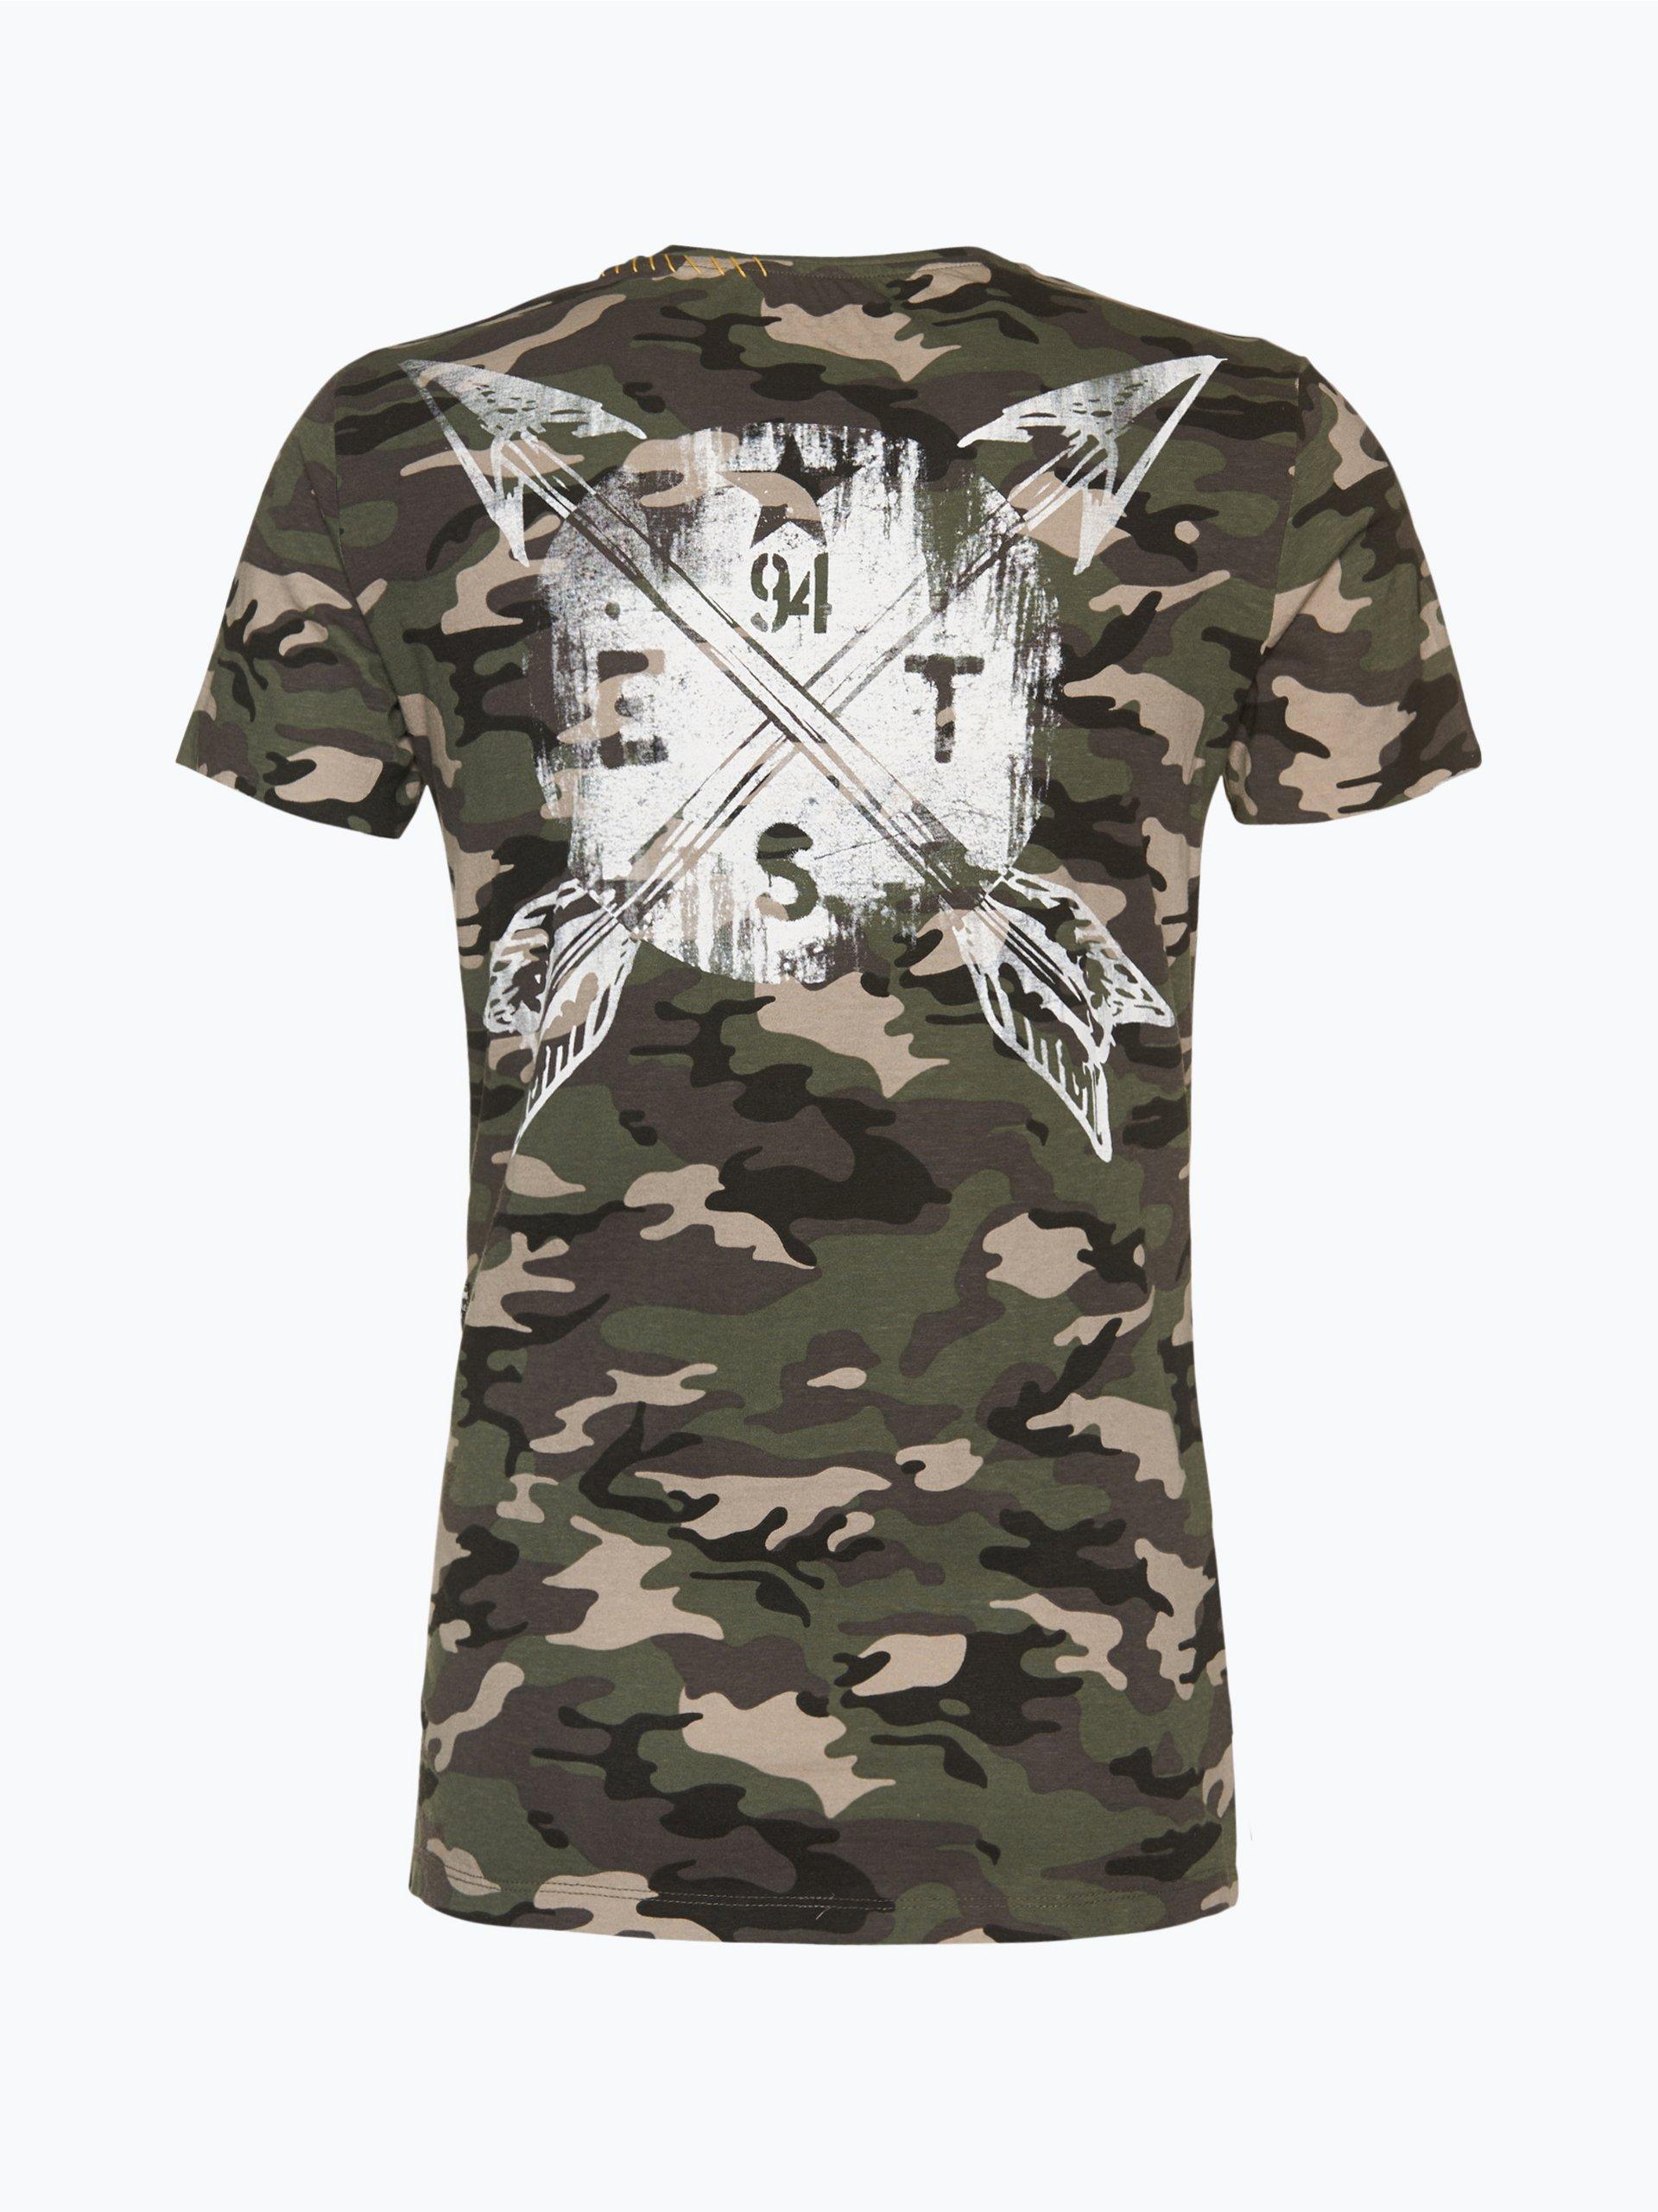 Key Largo Herren T Shirt St Louis Tanne Gemustert